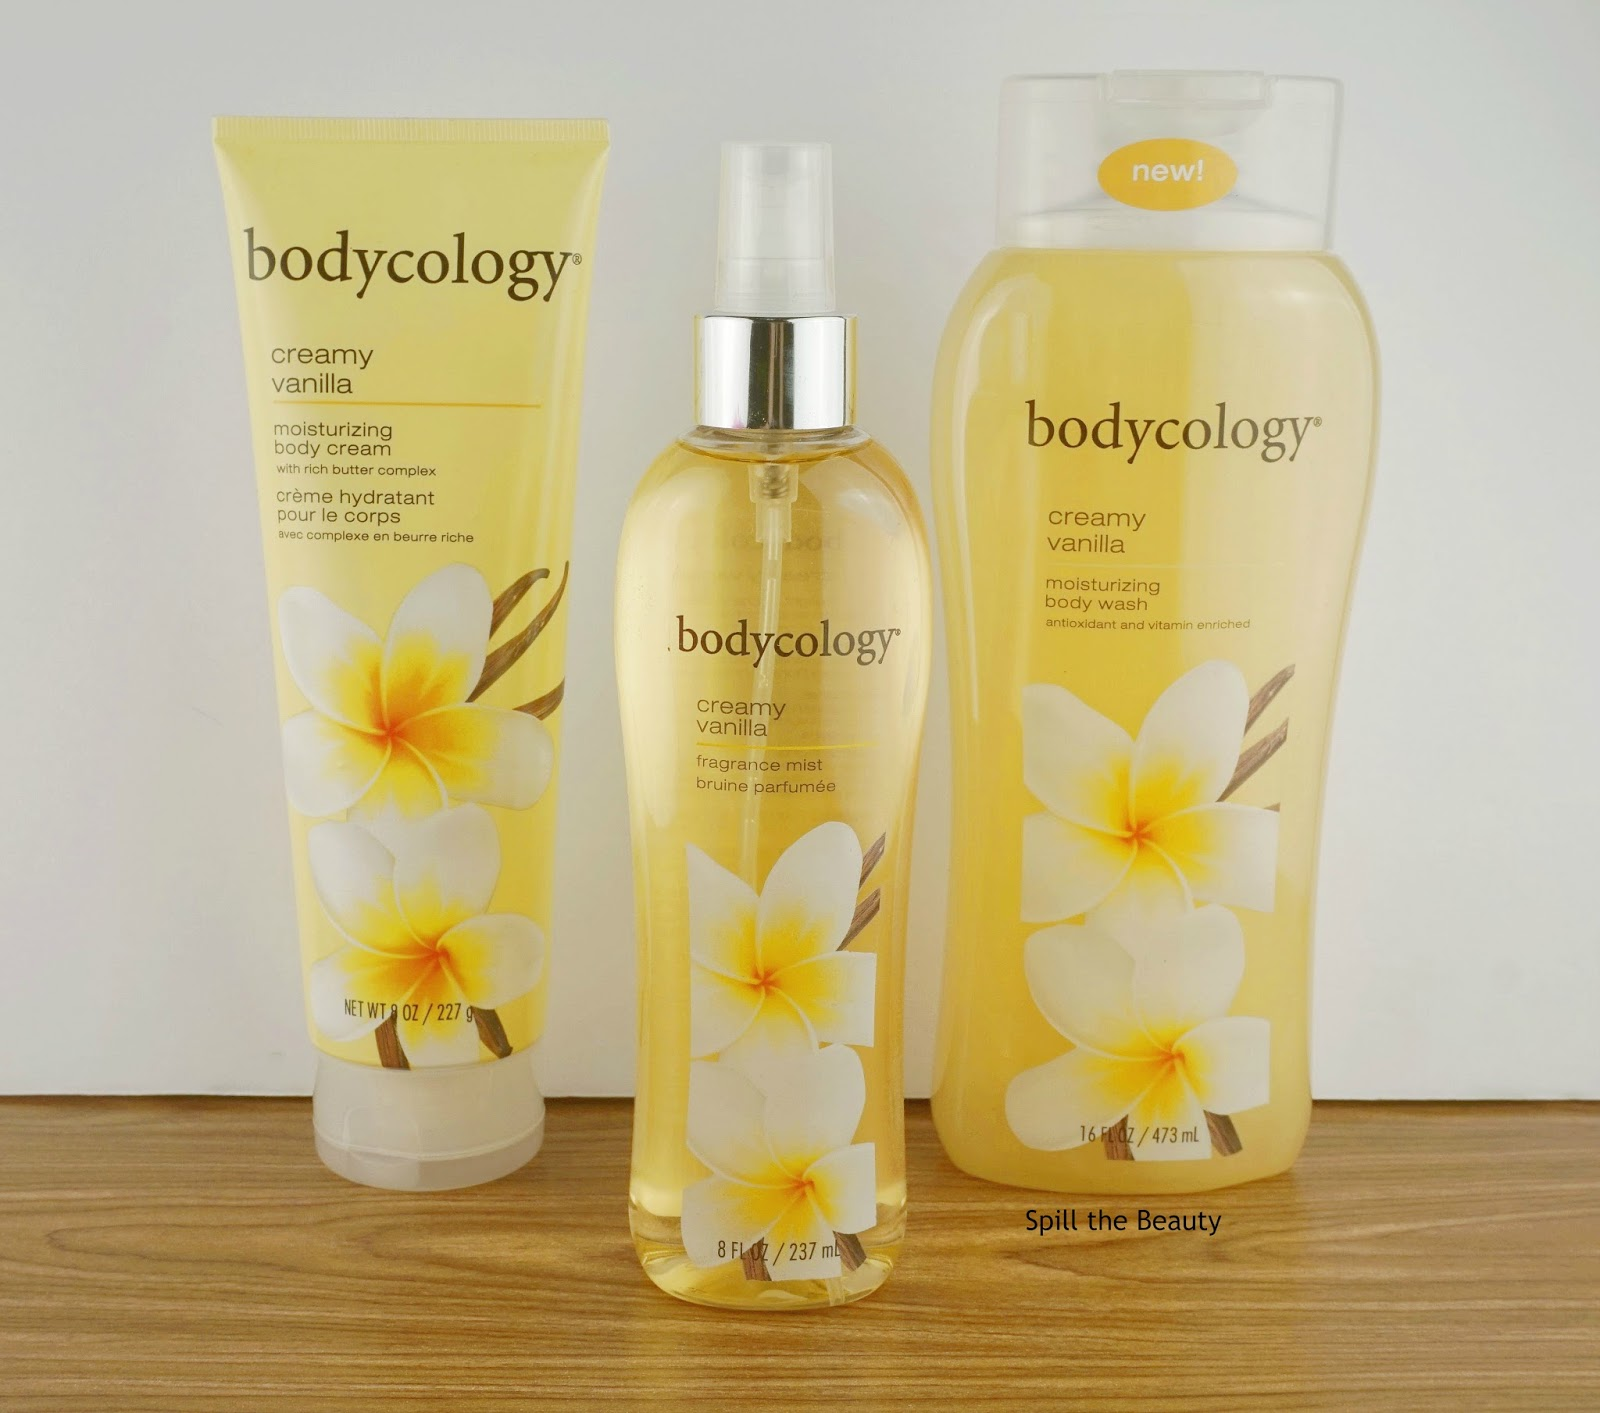 bodycology creamy vanilla bodycare